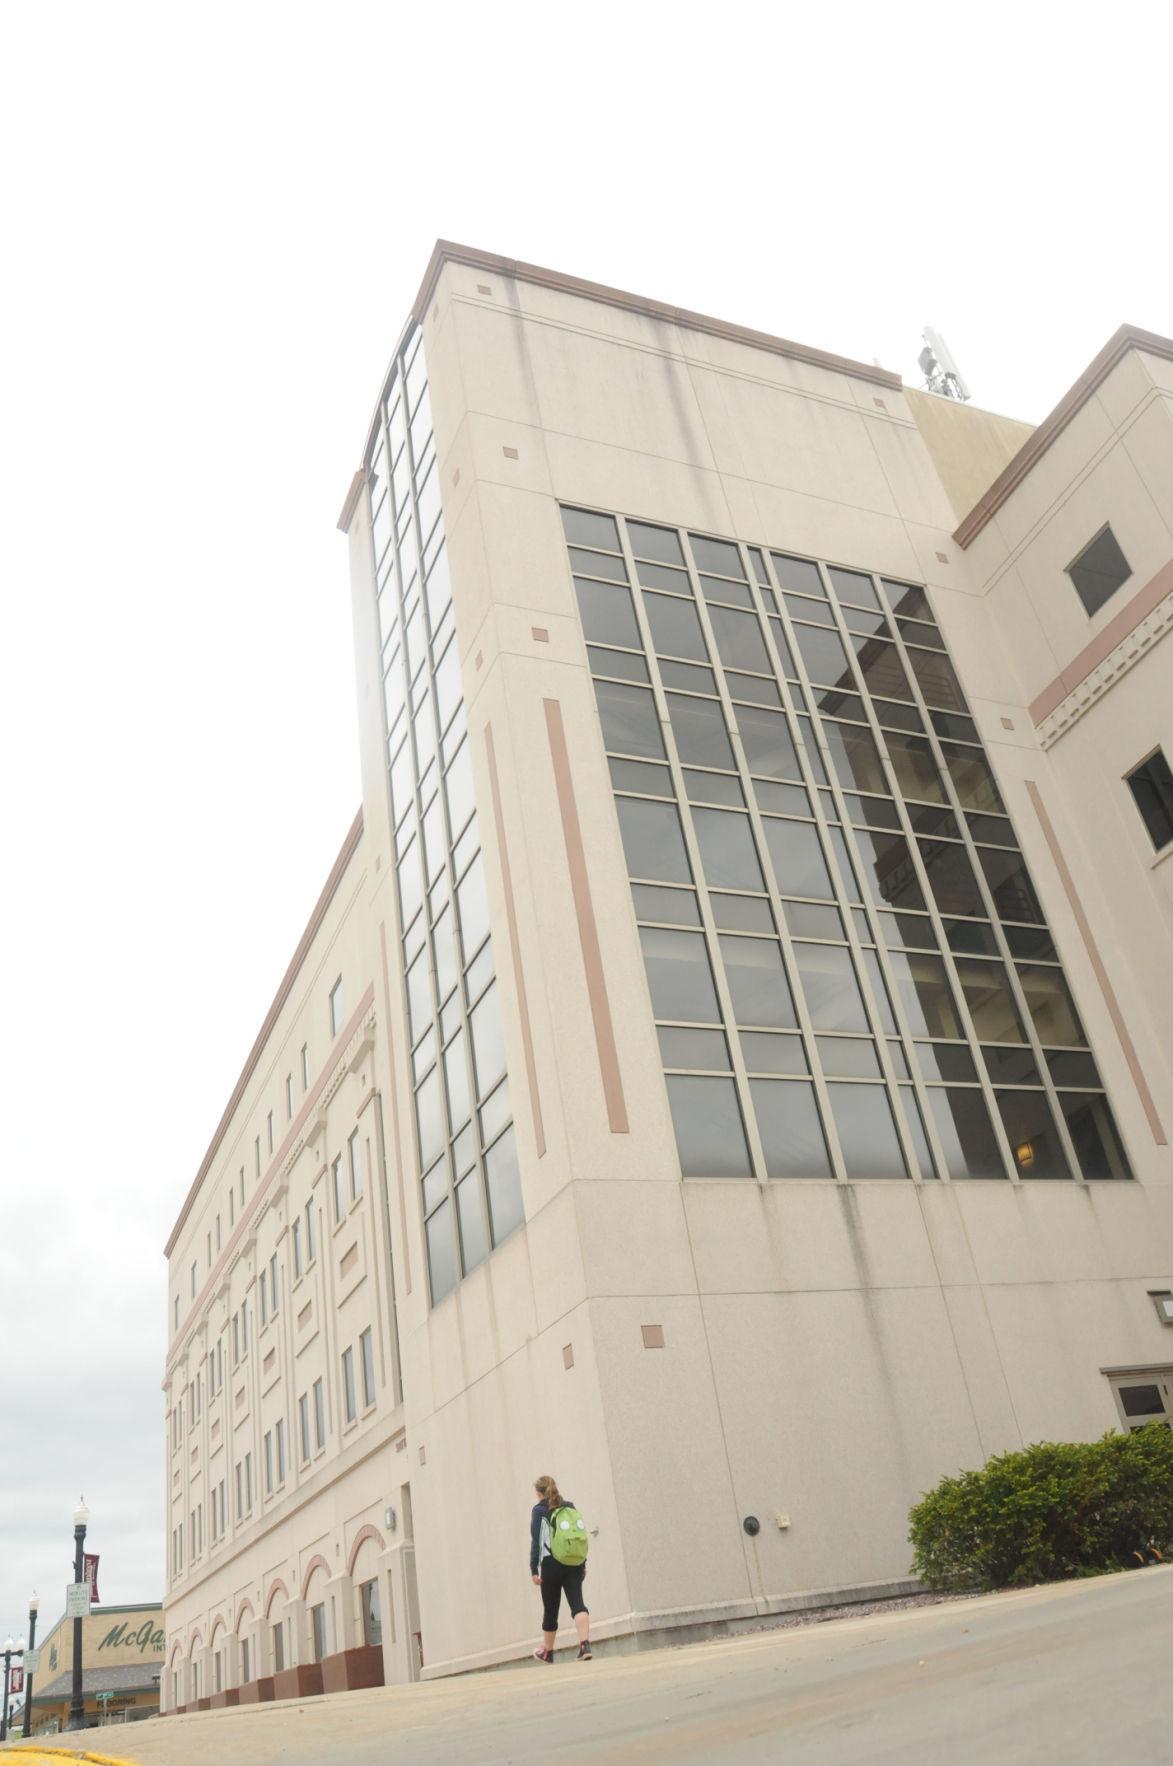 Sauk County Board building